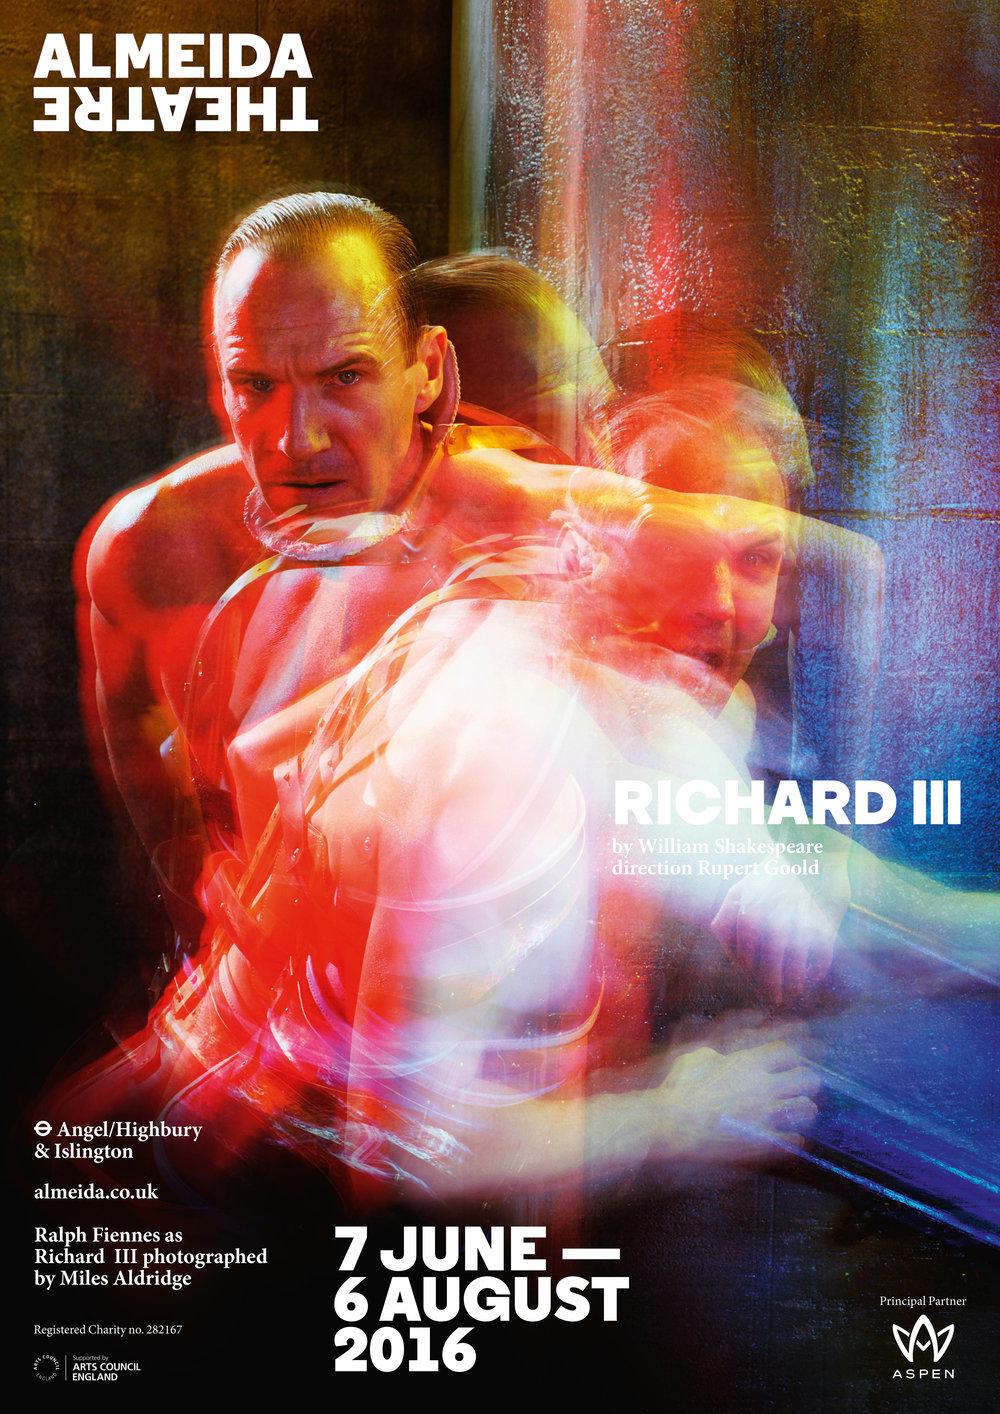 Richard III postersmall.jpg